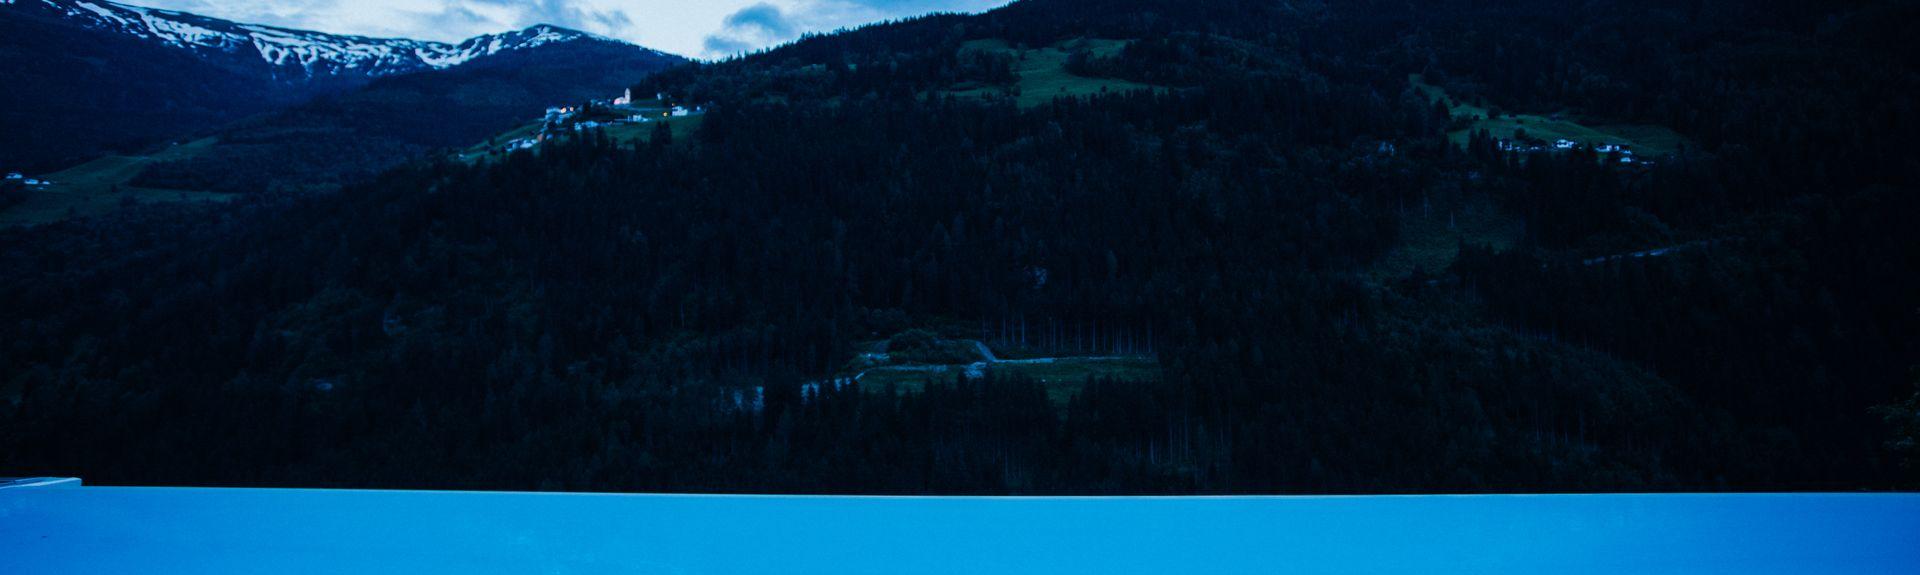 Bach, Tirol, Oostenrijk